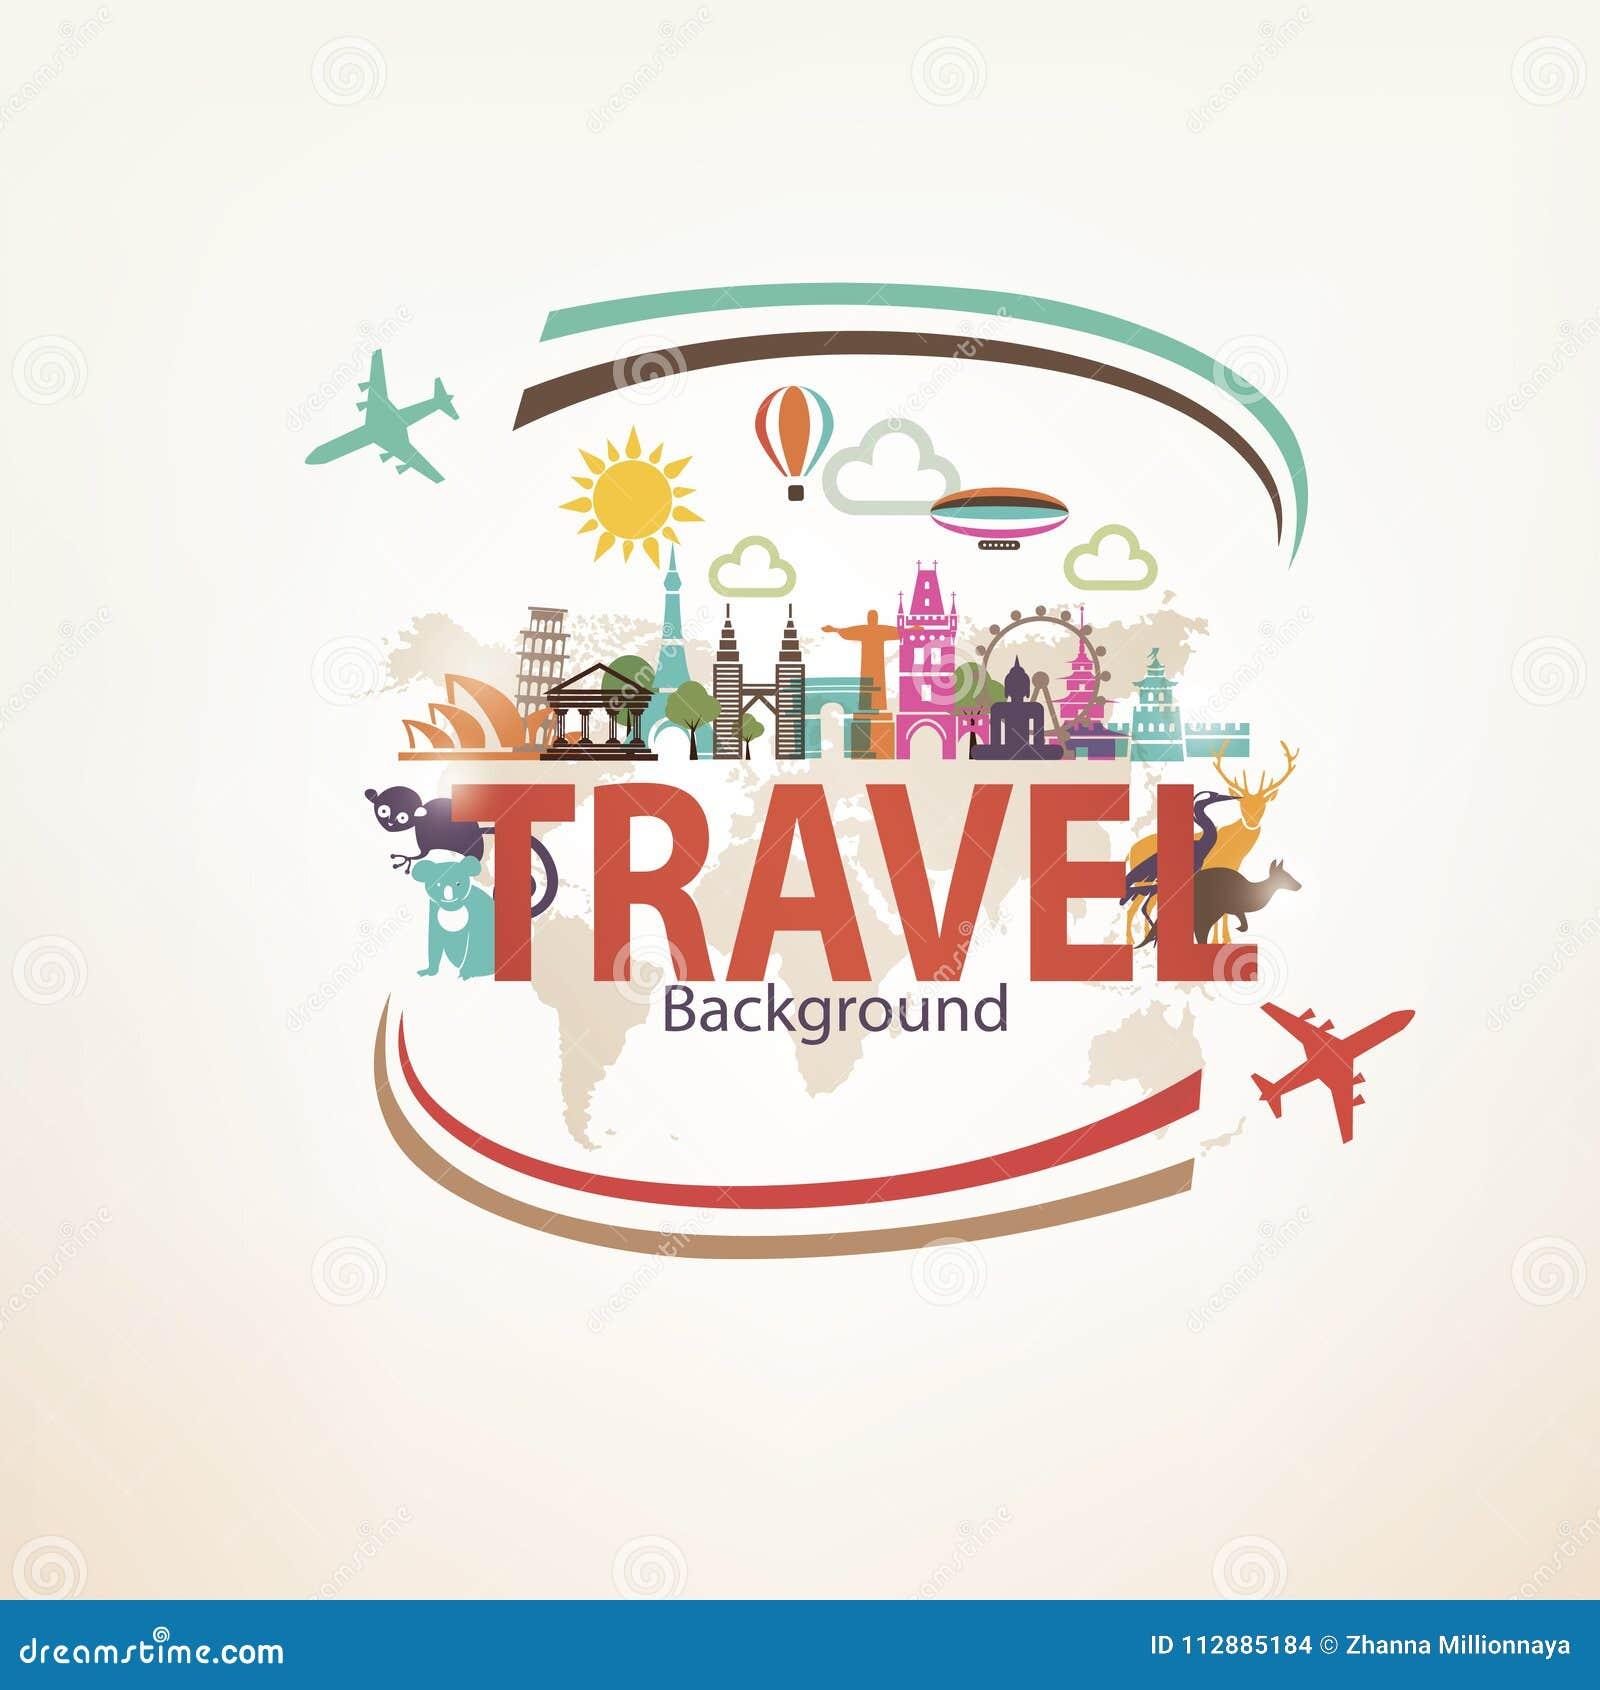 Around the world travel background